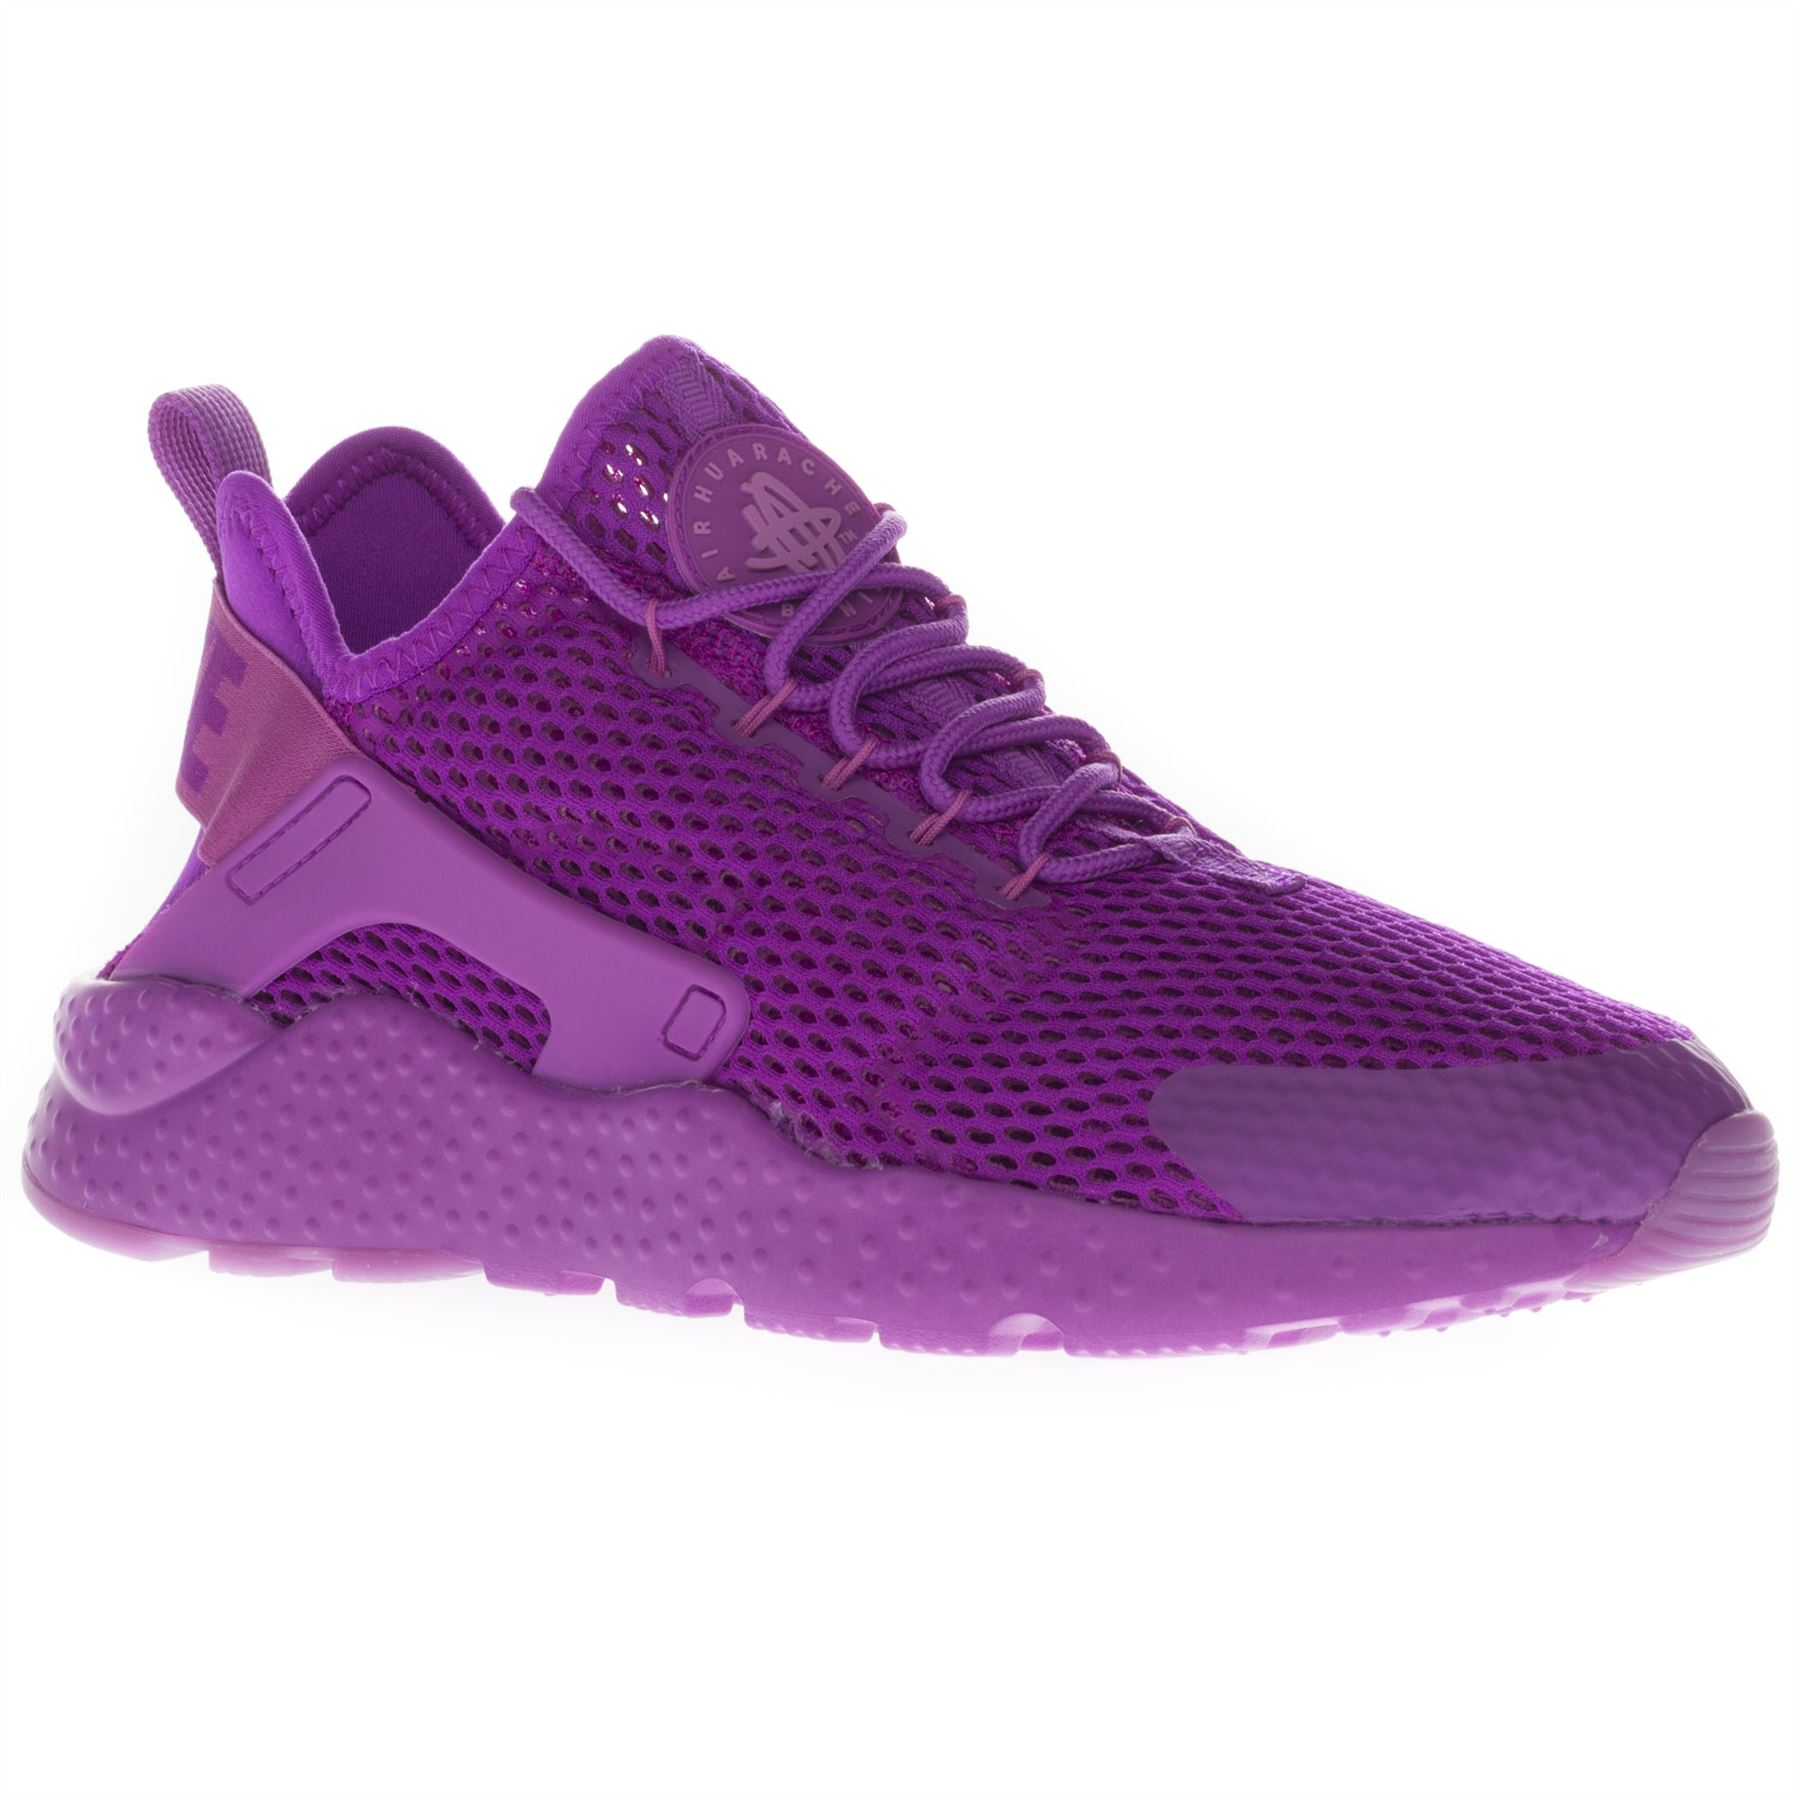 Nike Femme Ultra Air Huarache courir Ultra Femme faible Top Trainers 739246